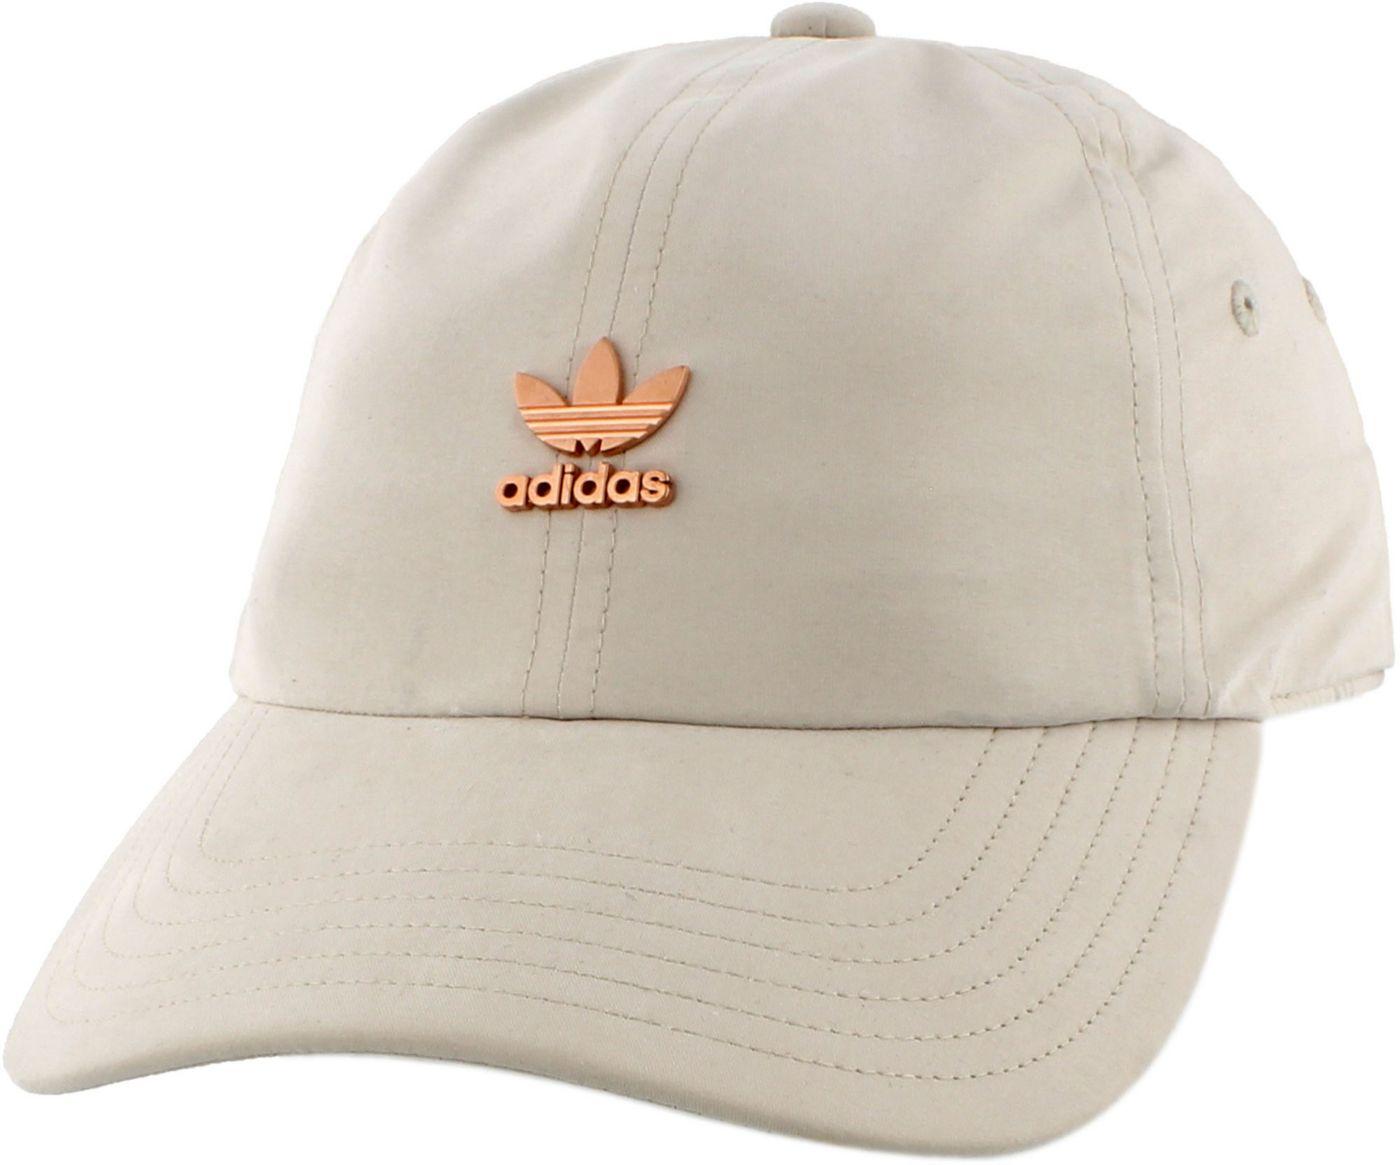 adidas Originals Women's Relaxed Metal Strapback Hat